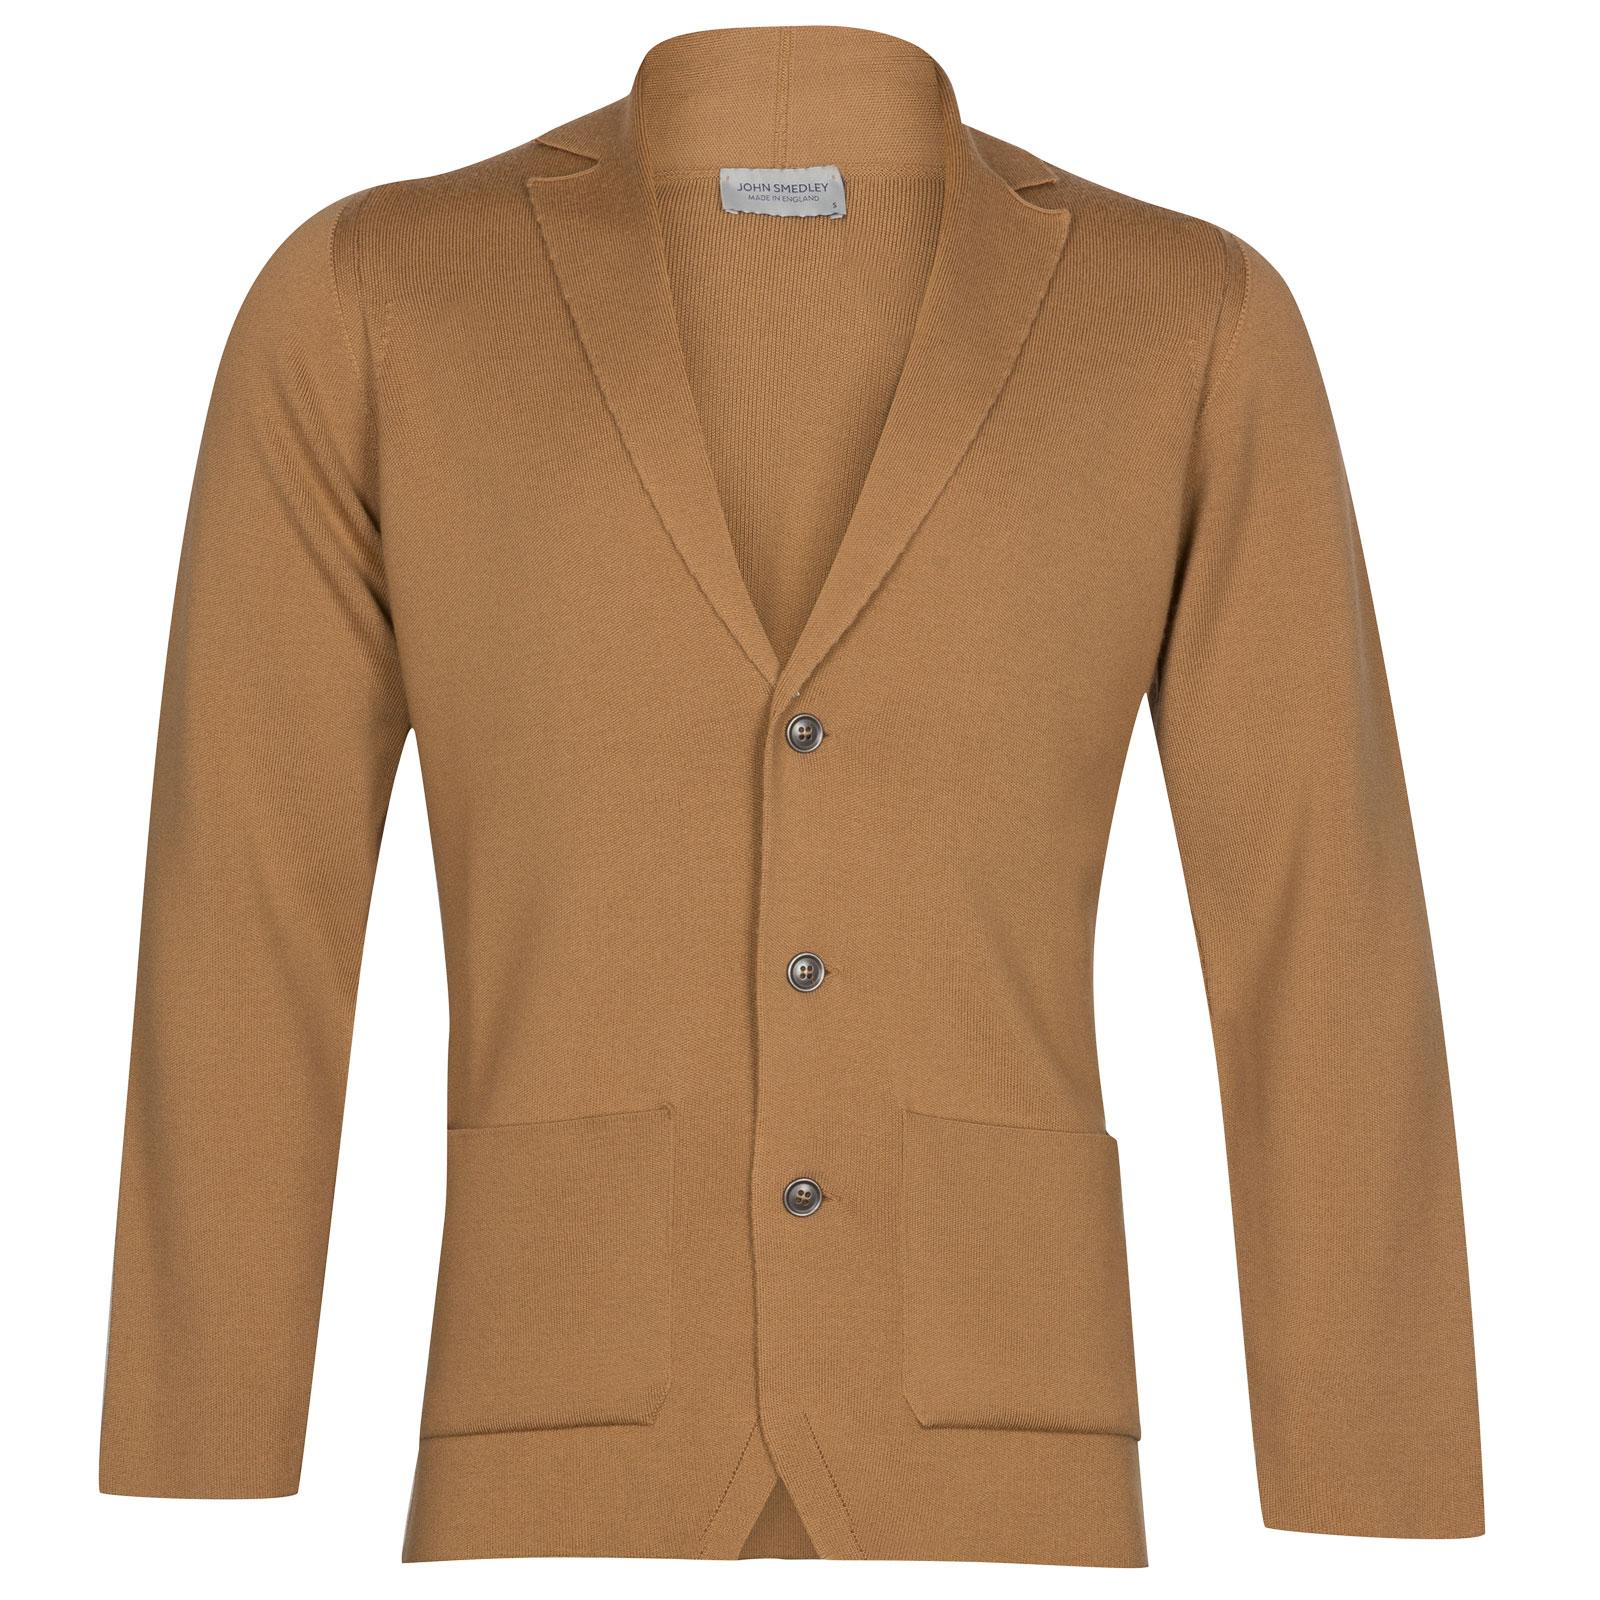 John Smedley Oxland Merino Wool Jacket in Camel-M